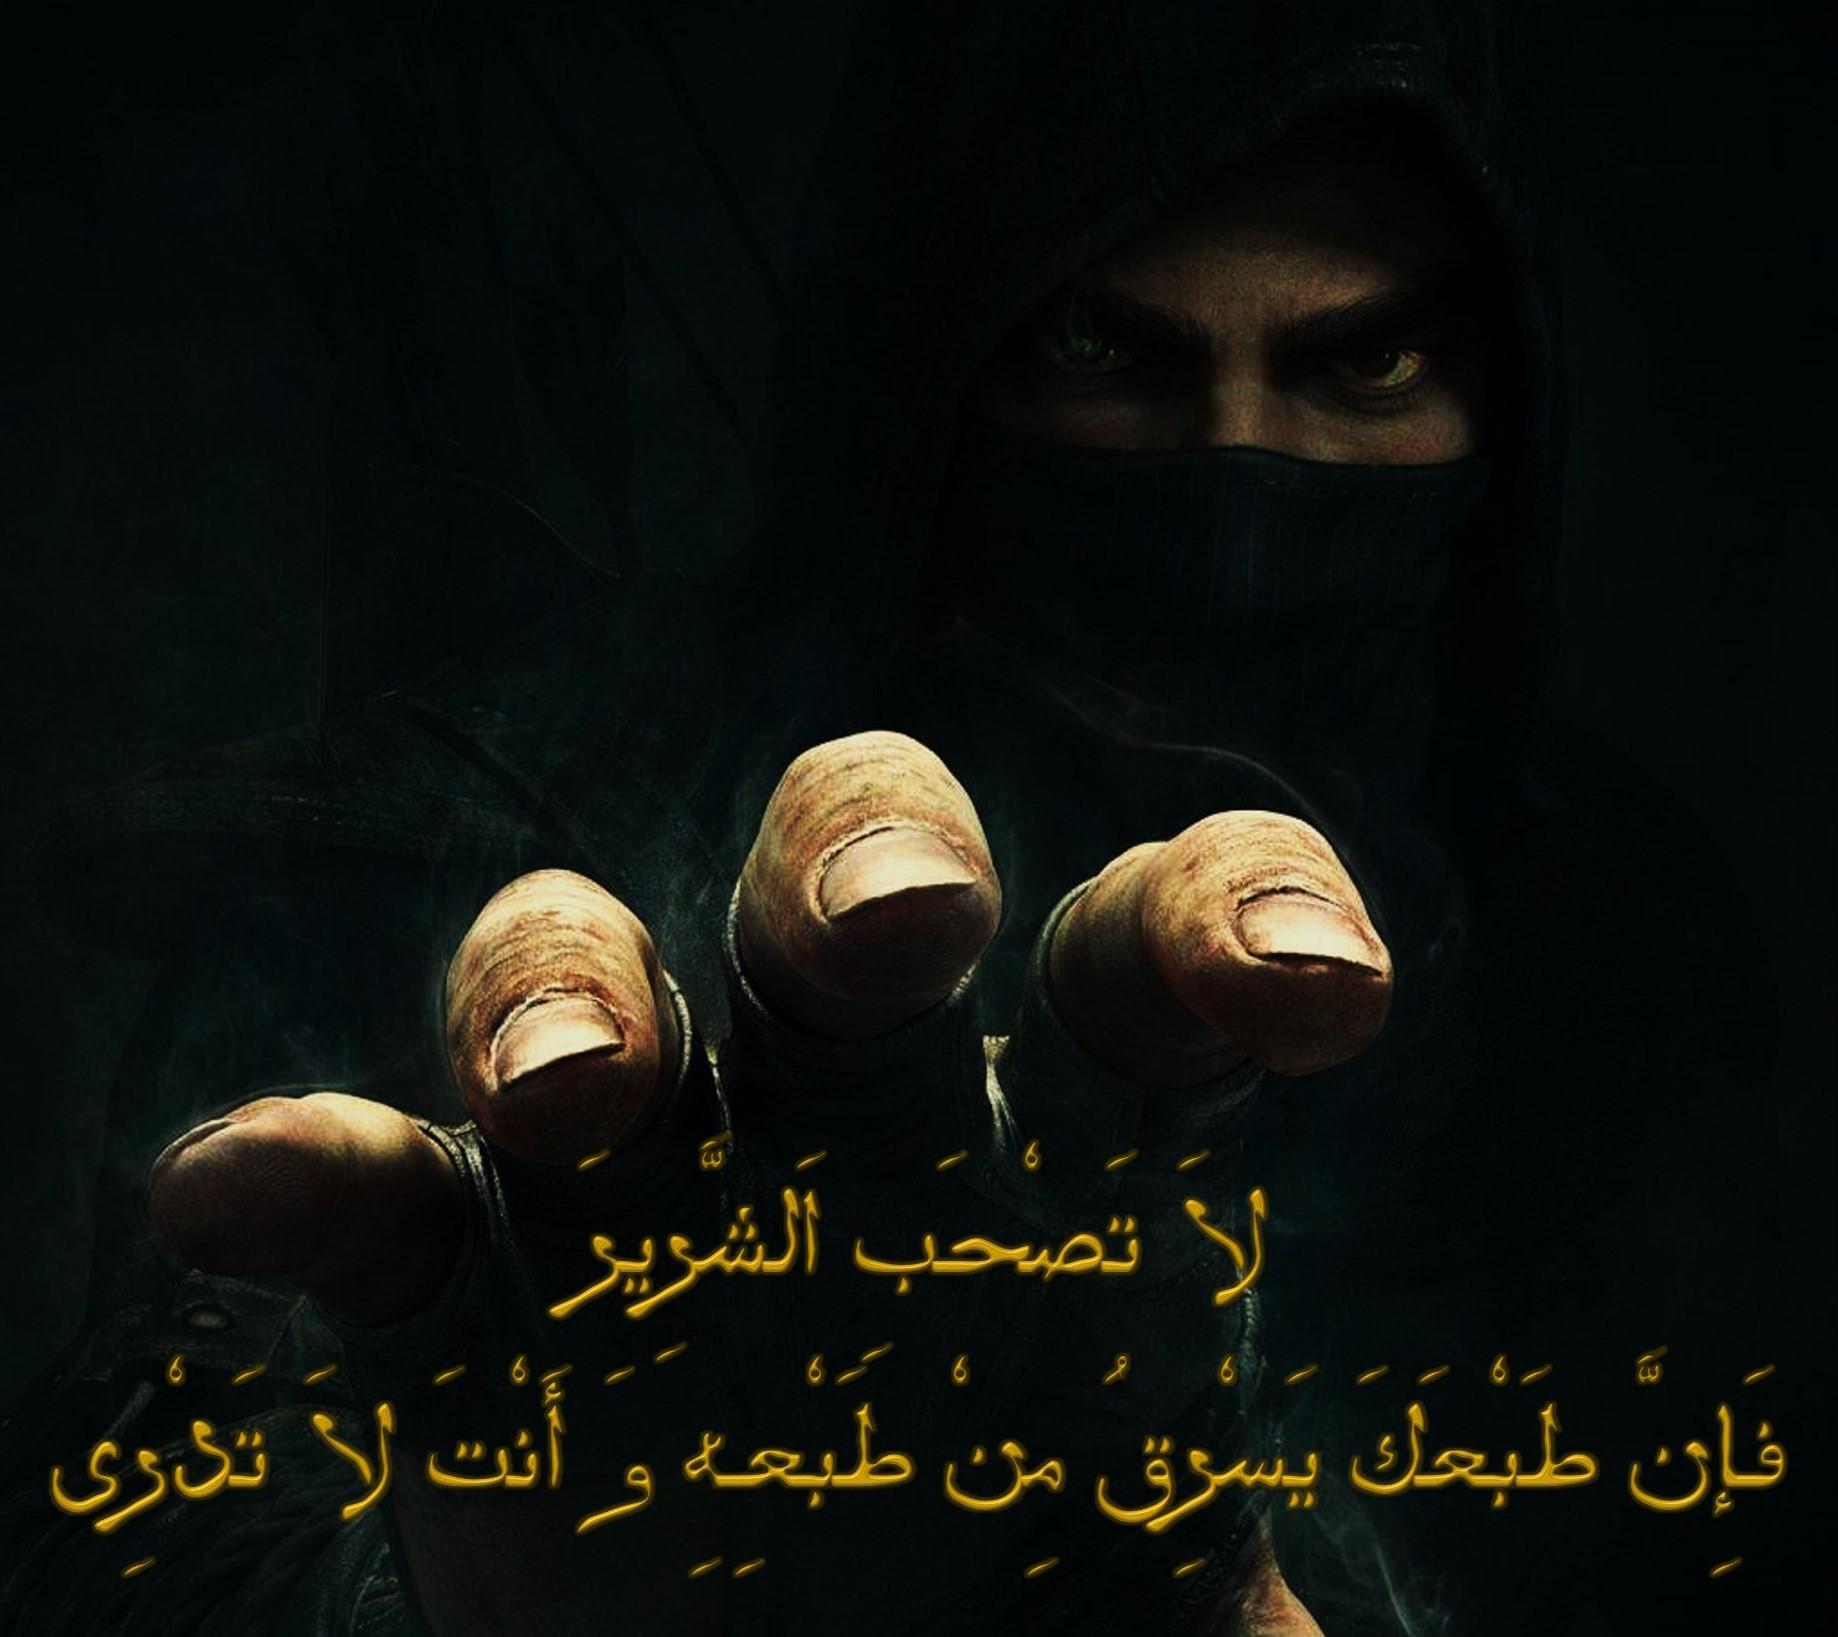 مصاحب الشریر